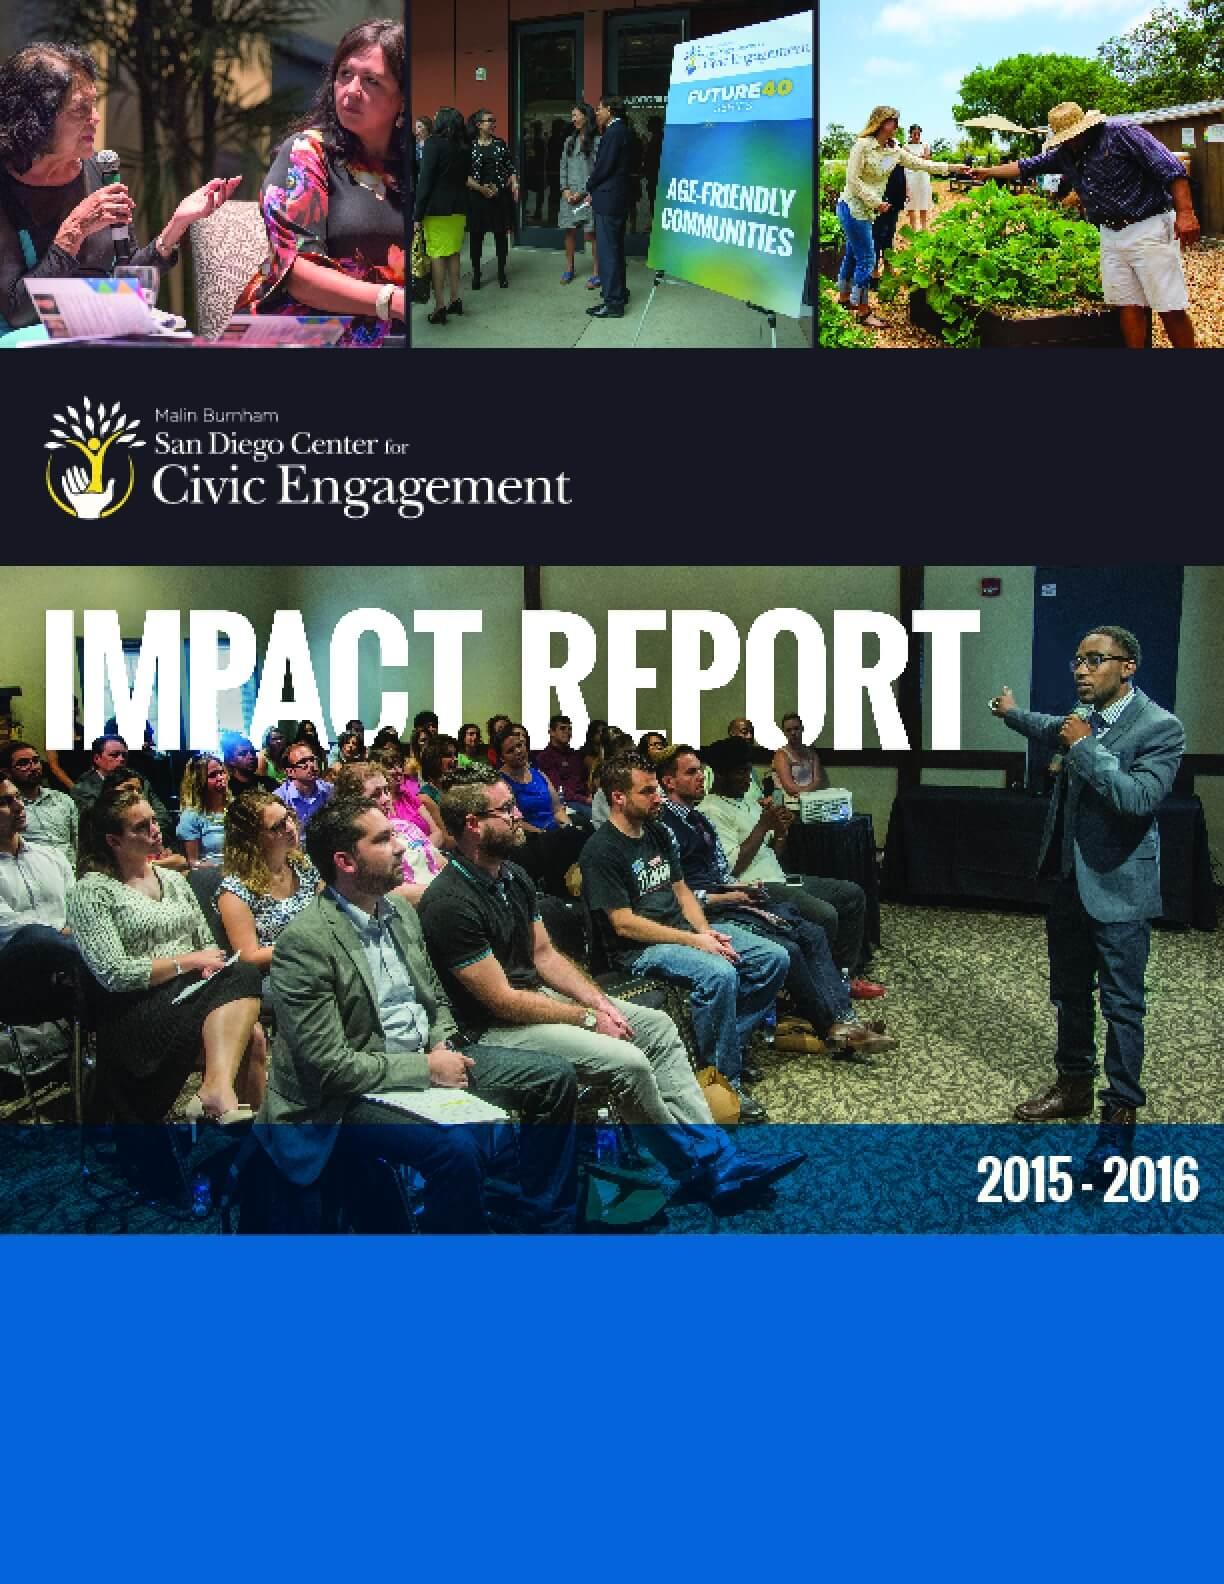 Malin Burnham Center for Civic Engagement Impact report 2015-2016